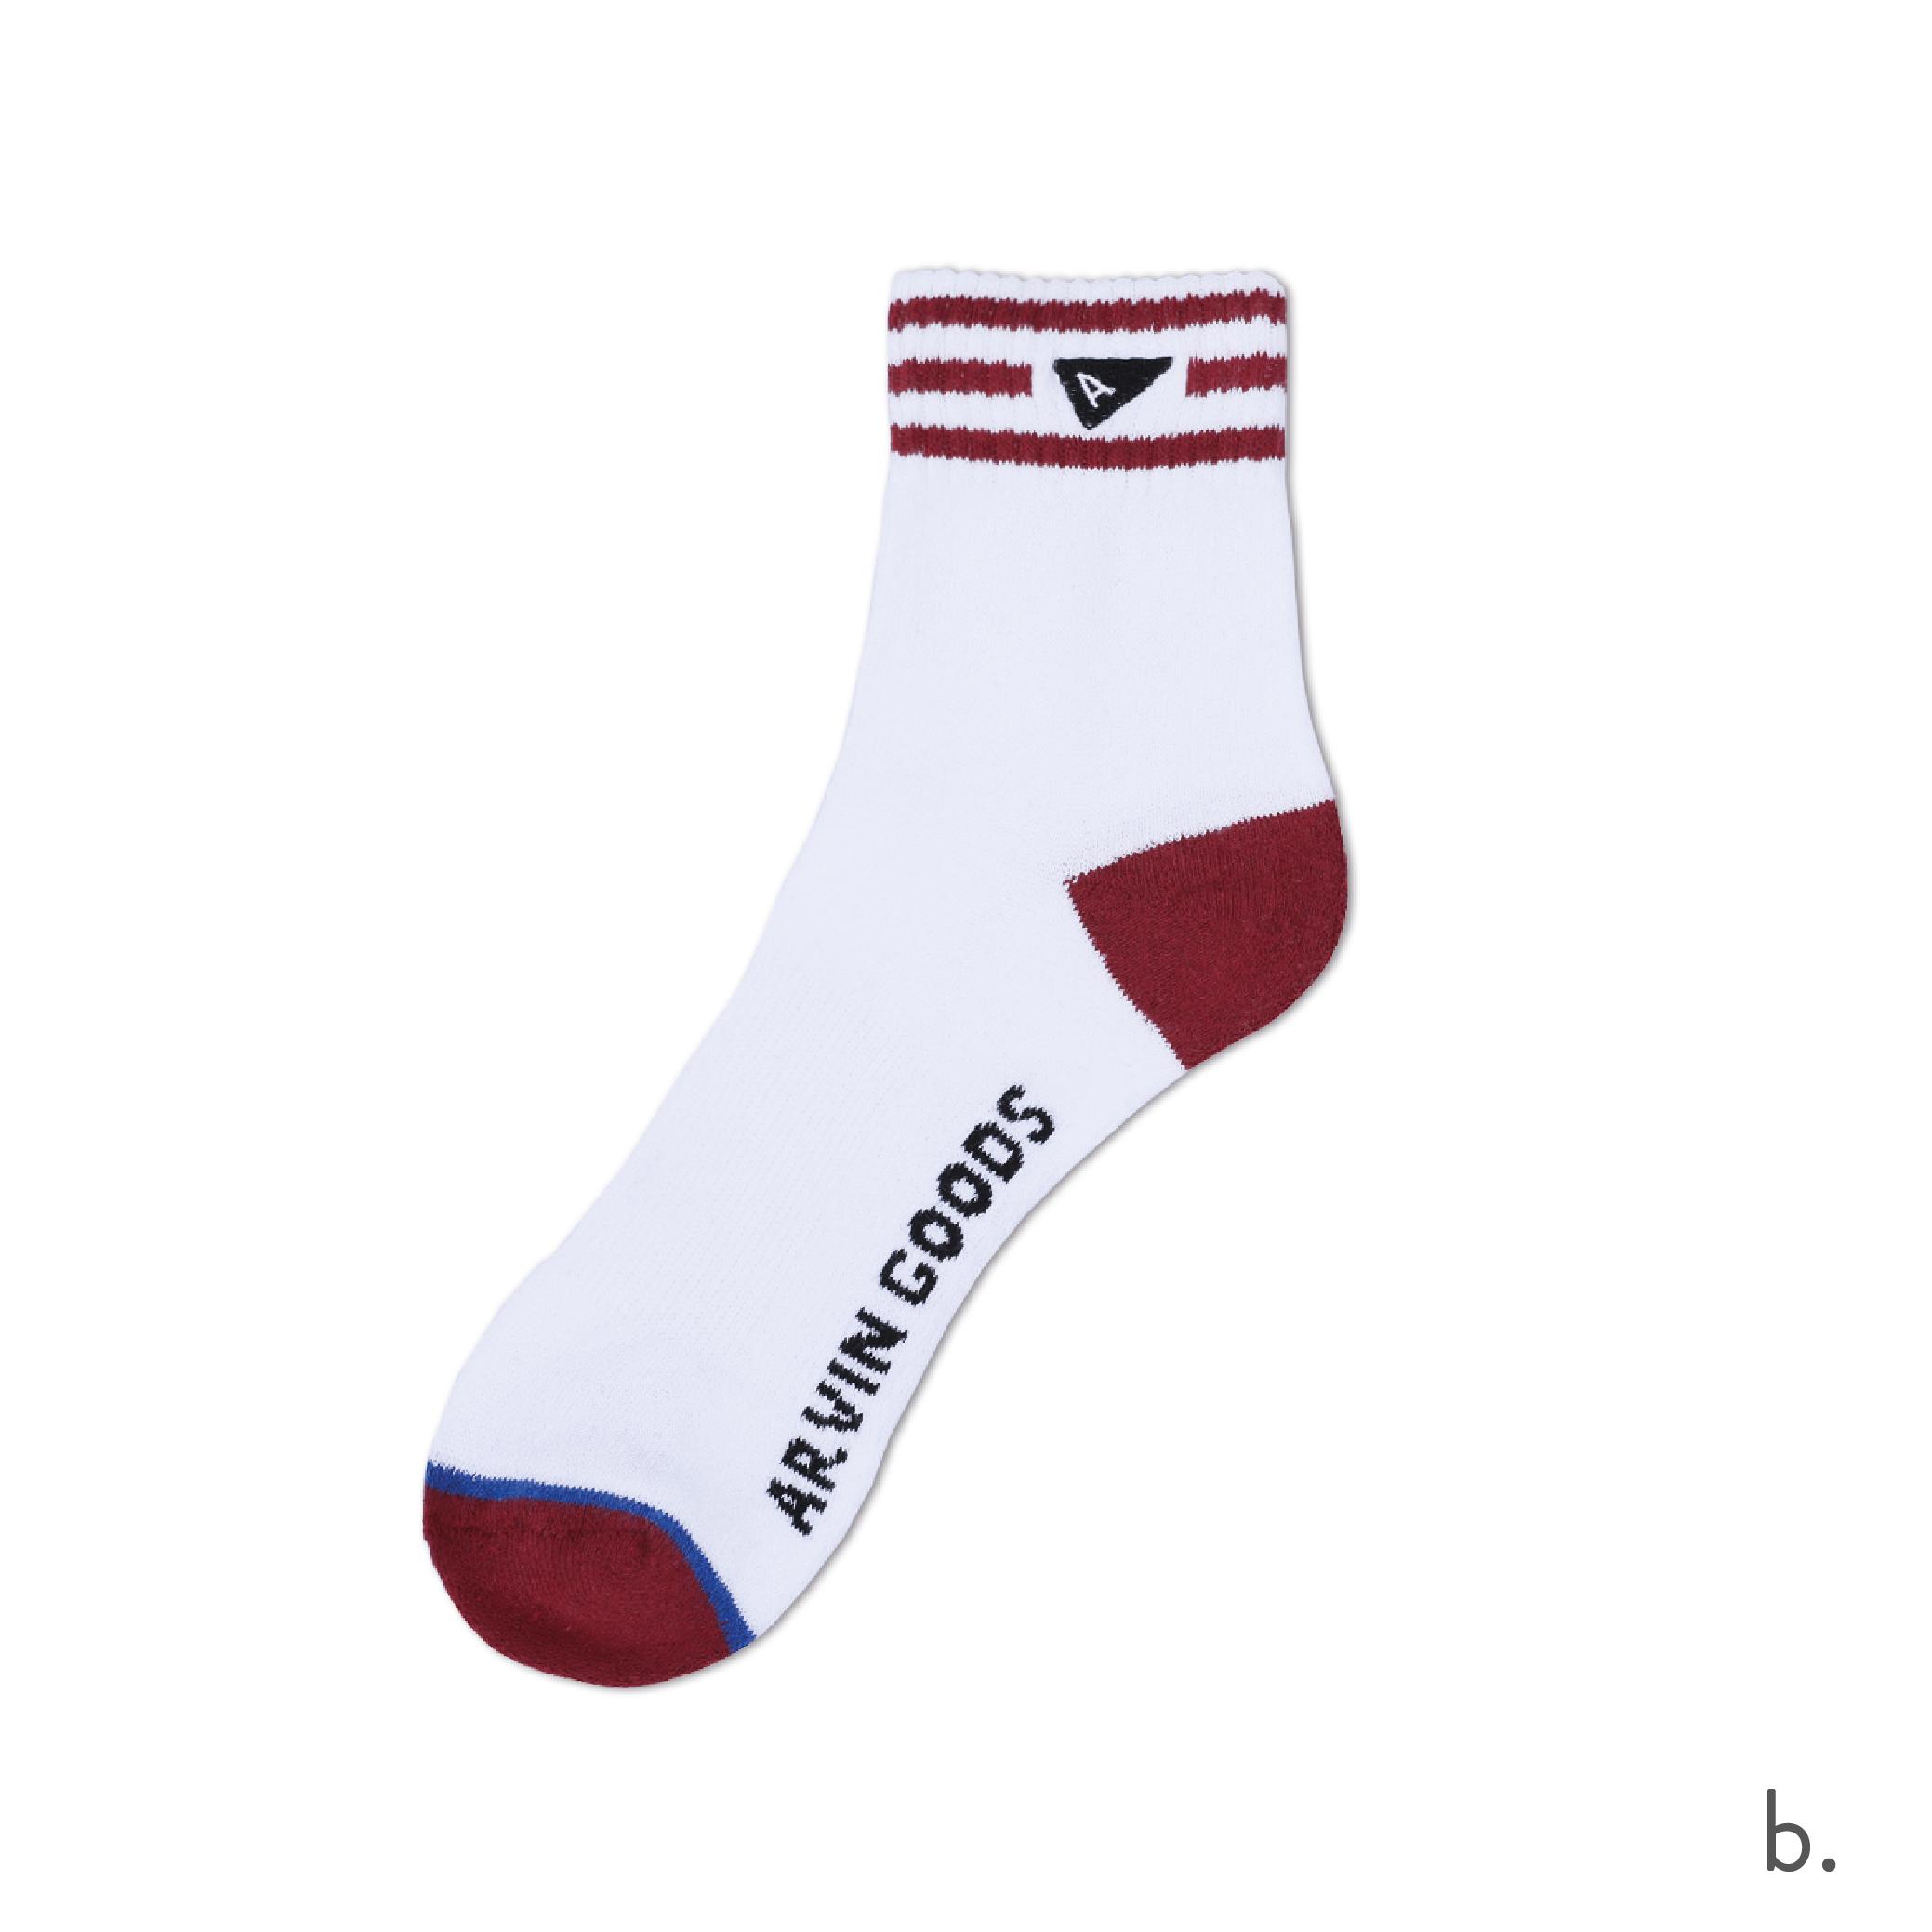 b. Burgundy & White Crew Sock.png